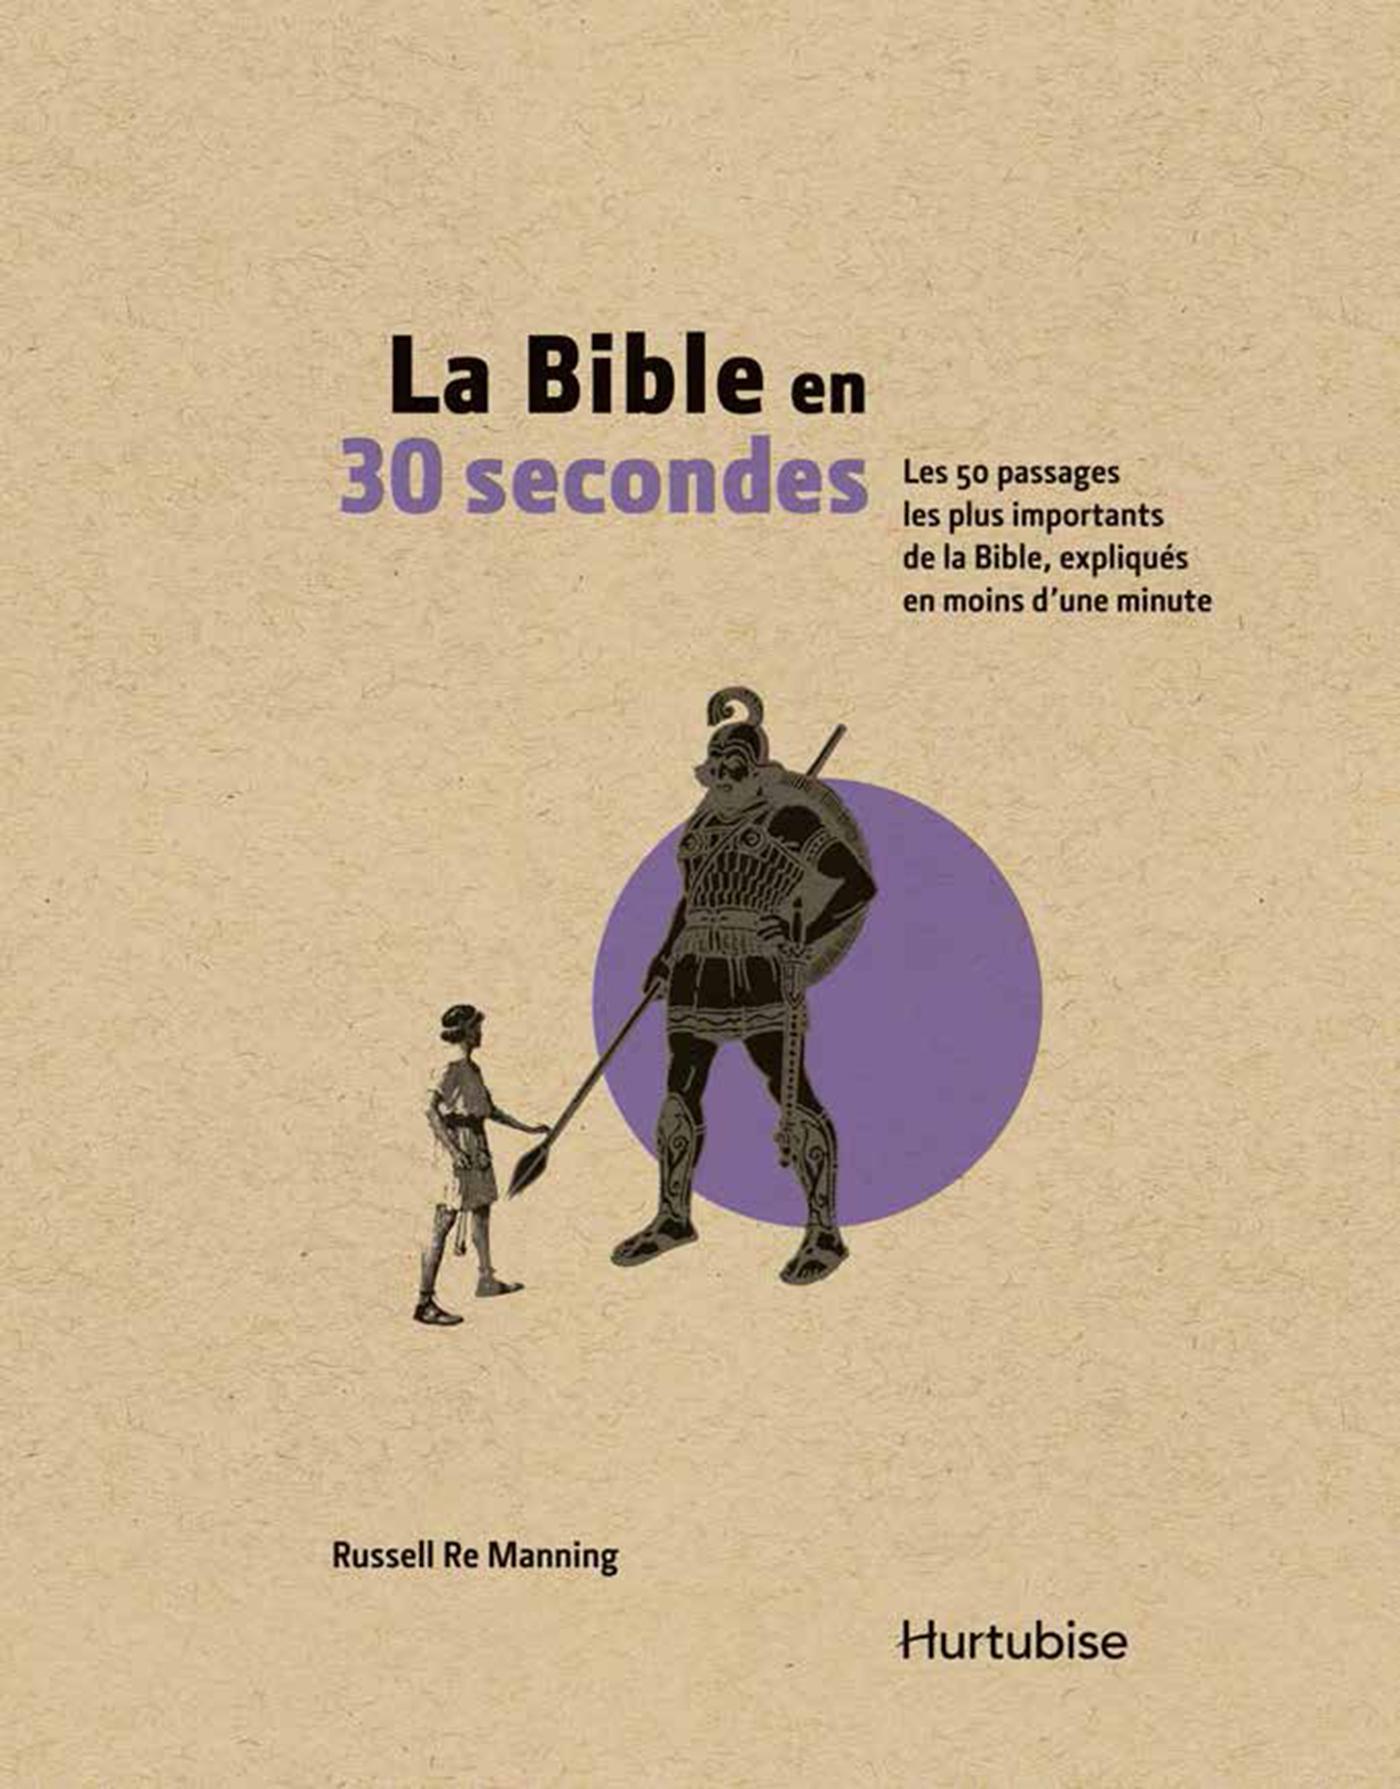 La Bible en 30 secondes